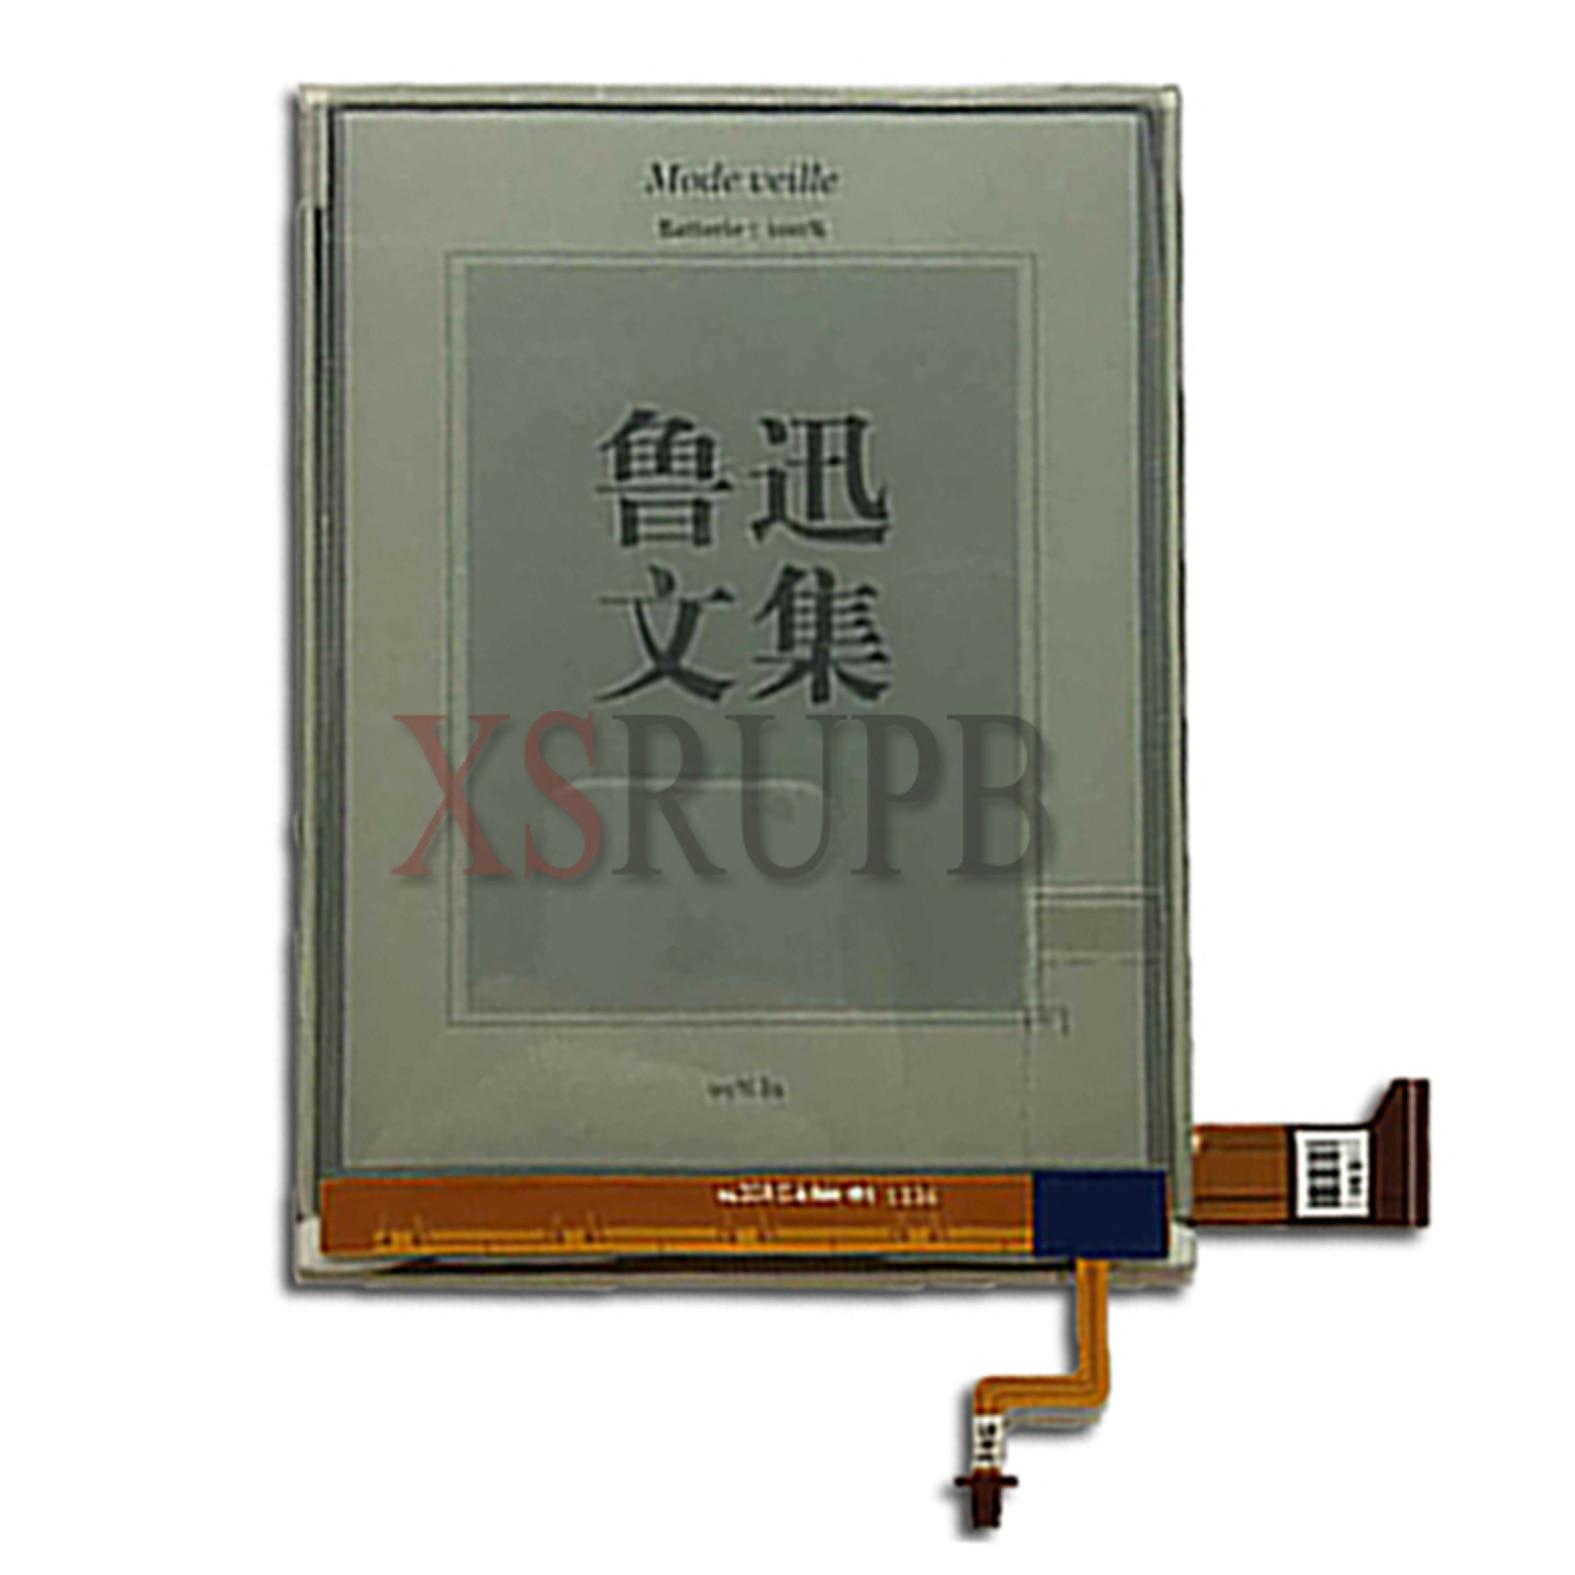 NEW Original 6.0inch E-Ink 768*1024 HD XGA Pearl Screen Glass For Onyx boox i62ml aurora Reader Ebook eReader LCD Display Panel<br>